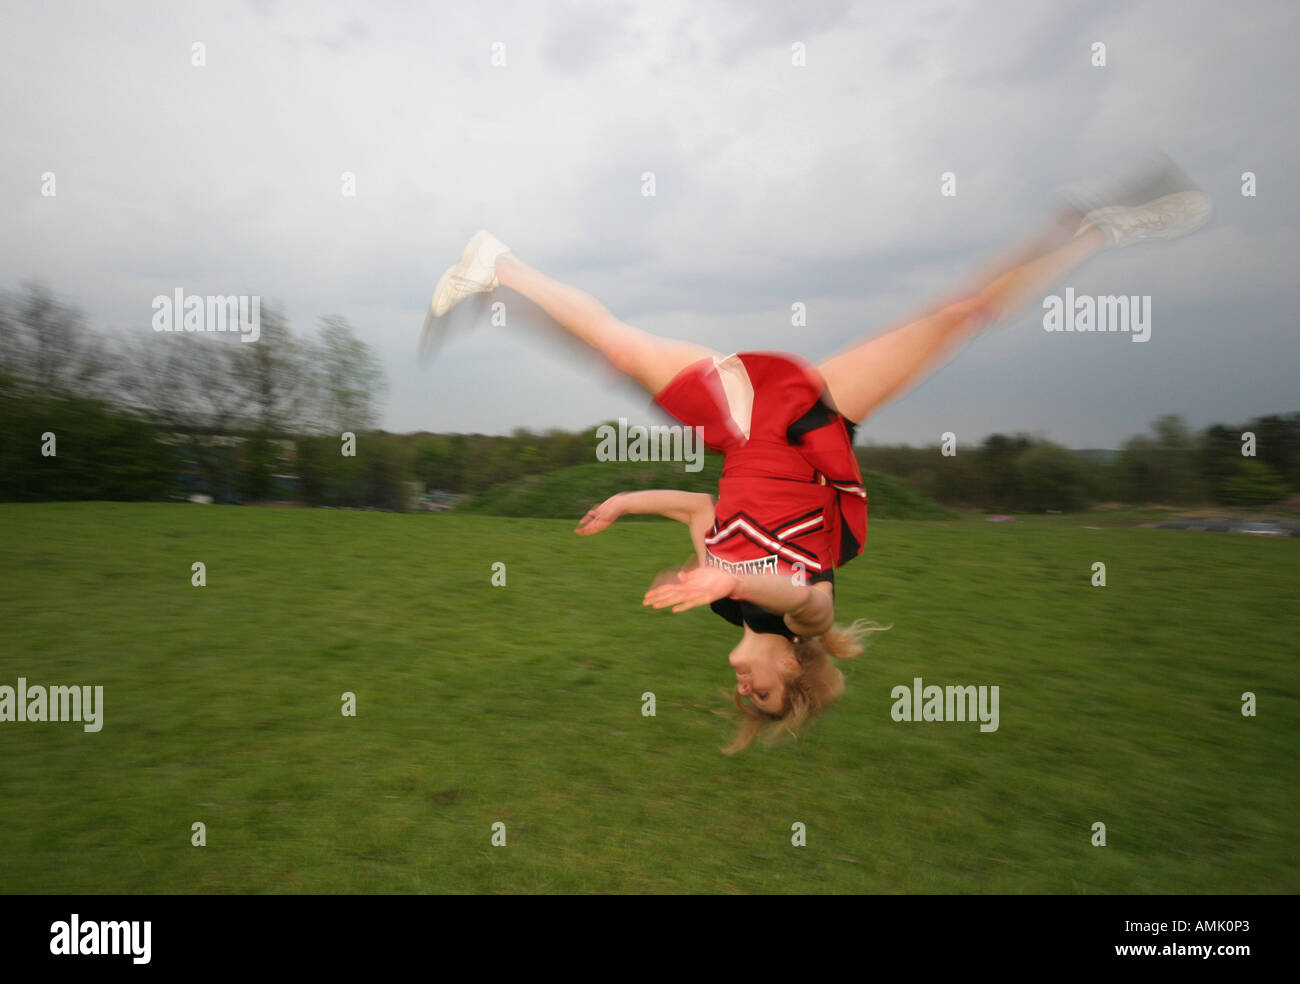 cheerleader doing a summersault - Stock Image